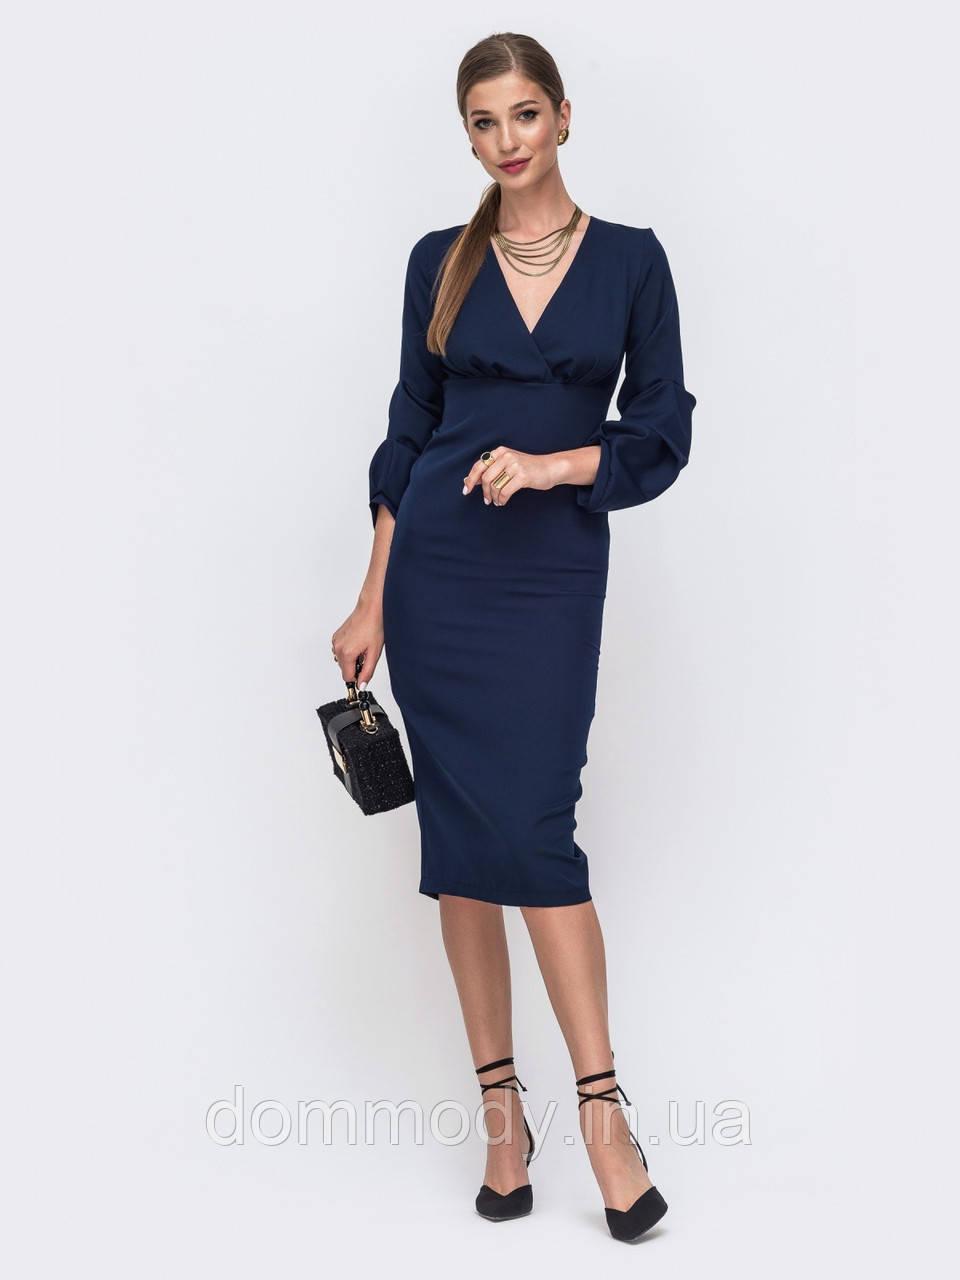 Платье женское Alexandrina blue